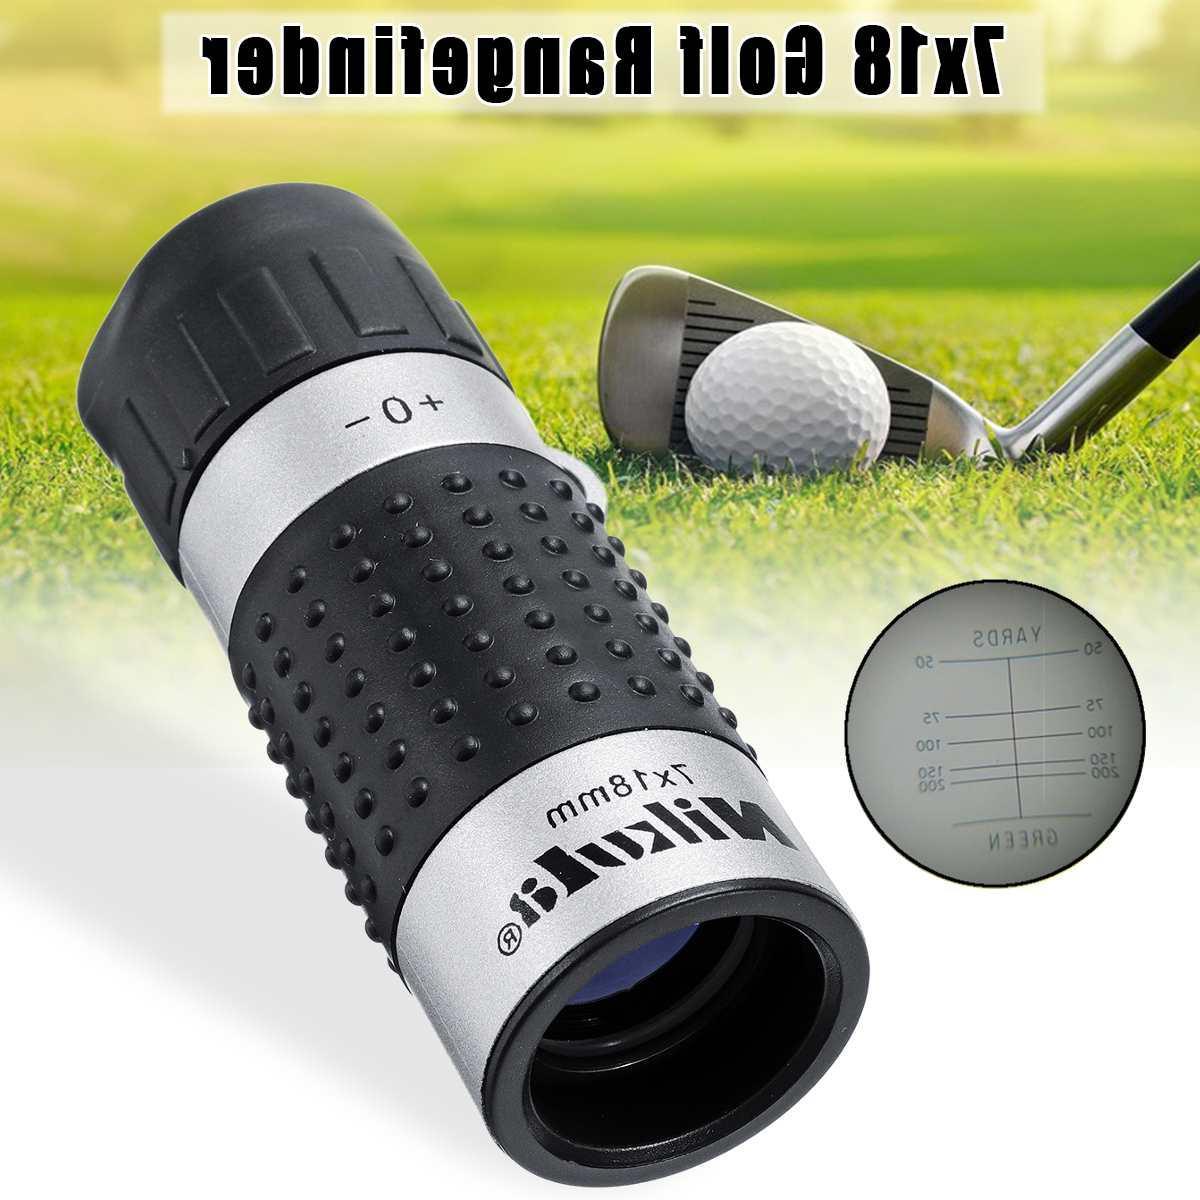 7x18 163m/1000m <font><b>Golf</b></font> Rangefinder Distance Meter <font><b>Finder</b></font> Binocular <font><b>Range</b></font> Surveillance Races